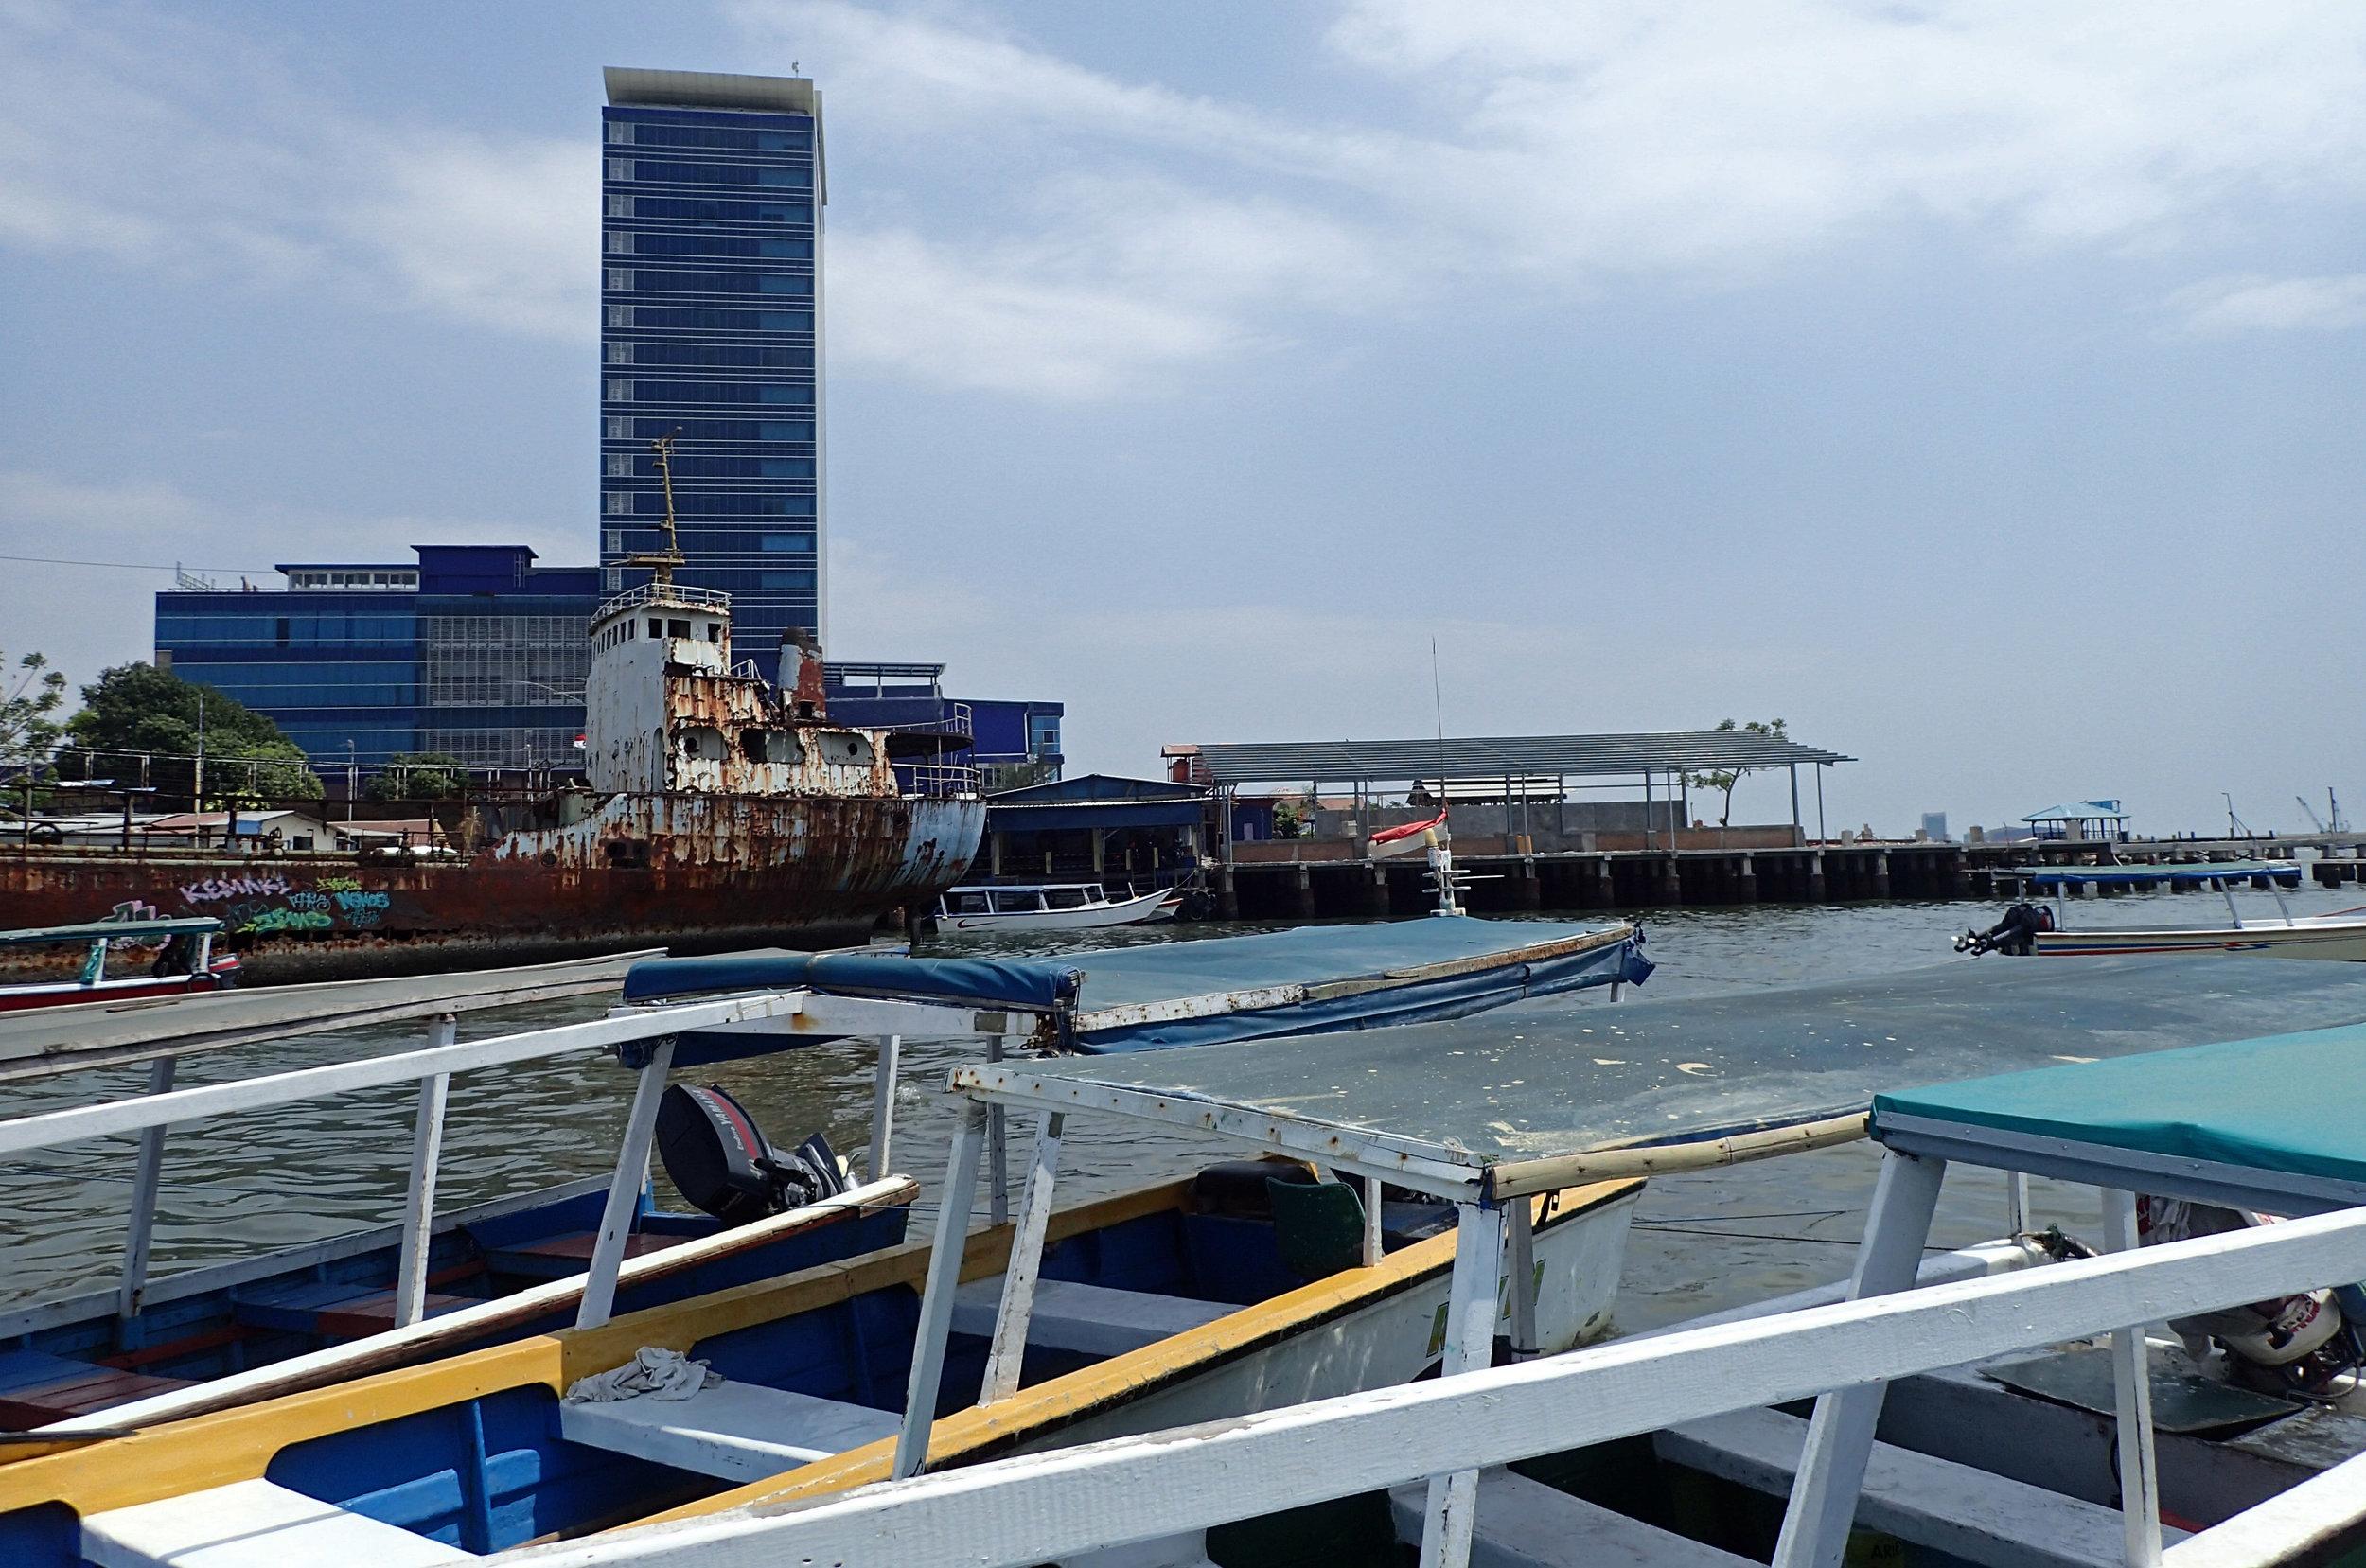 tourist boat marina.jpg